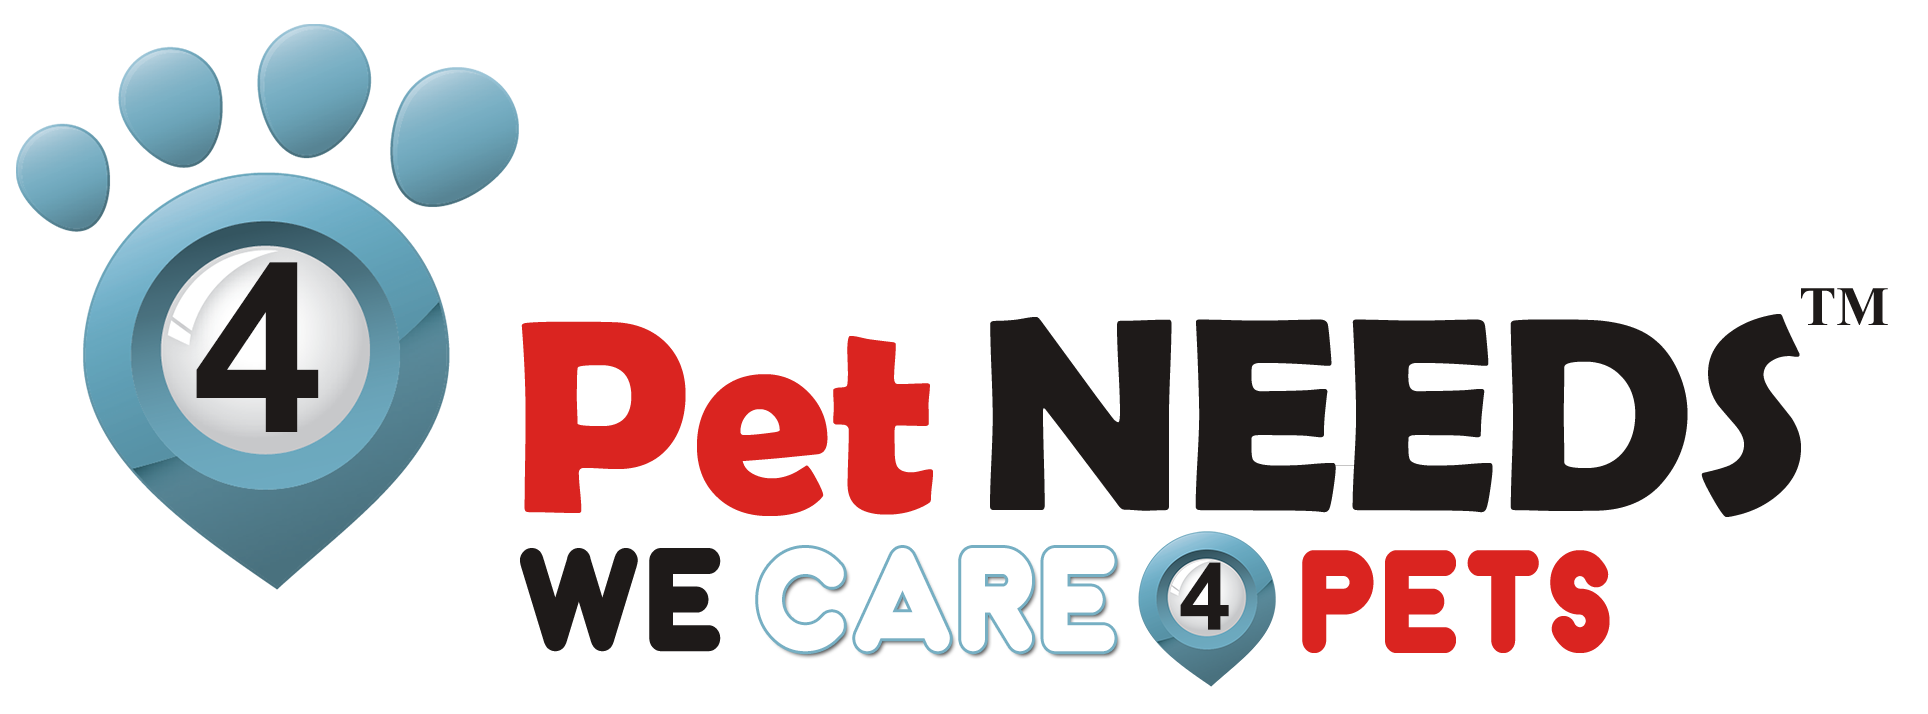 File:Online Pet Shop in Noida, India.png.